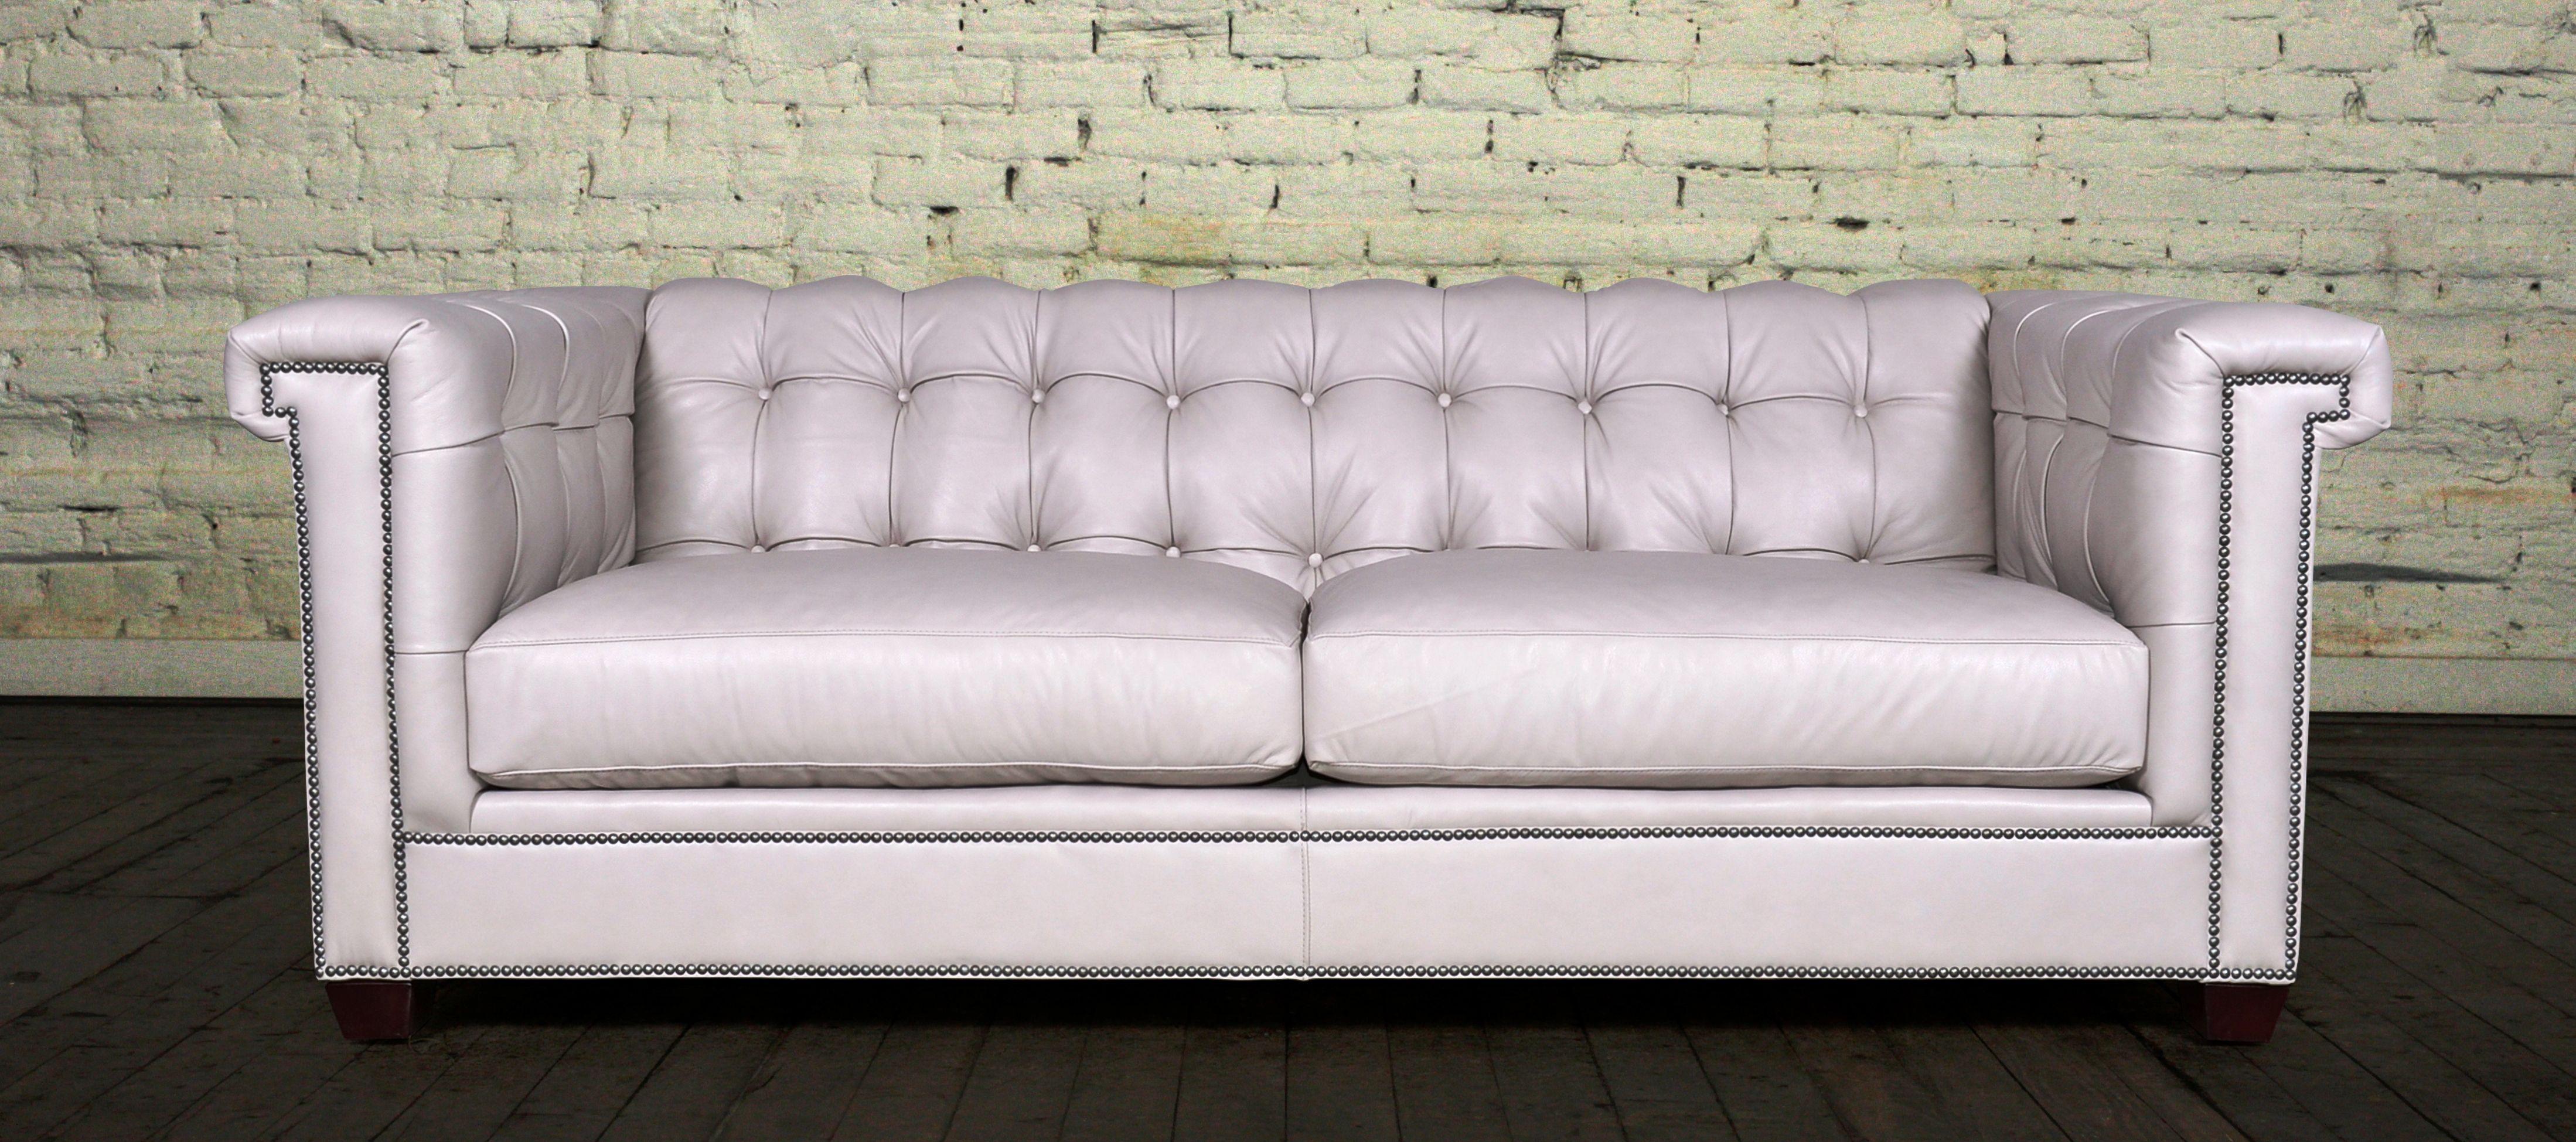 Enjoyable Lennox Tufted Leather Chesterfield Sofa Cococohome Sofa Short Links Chair Design For Home Short Linksinfo